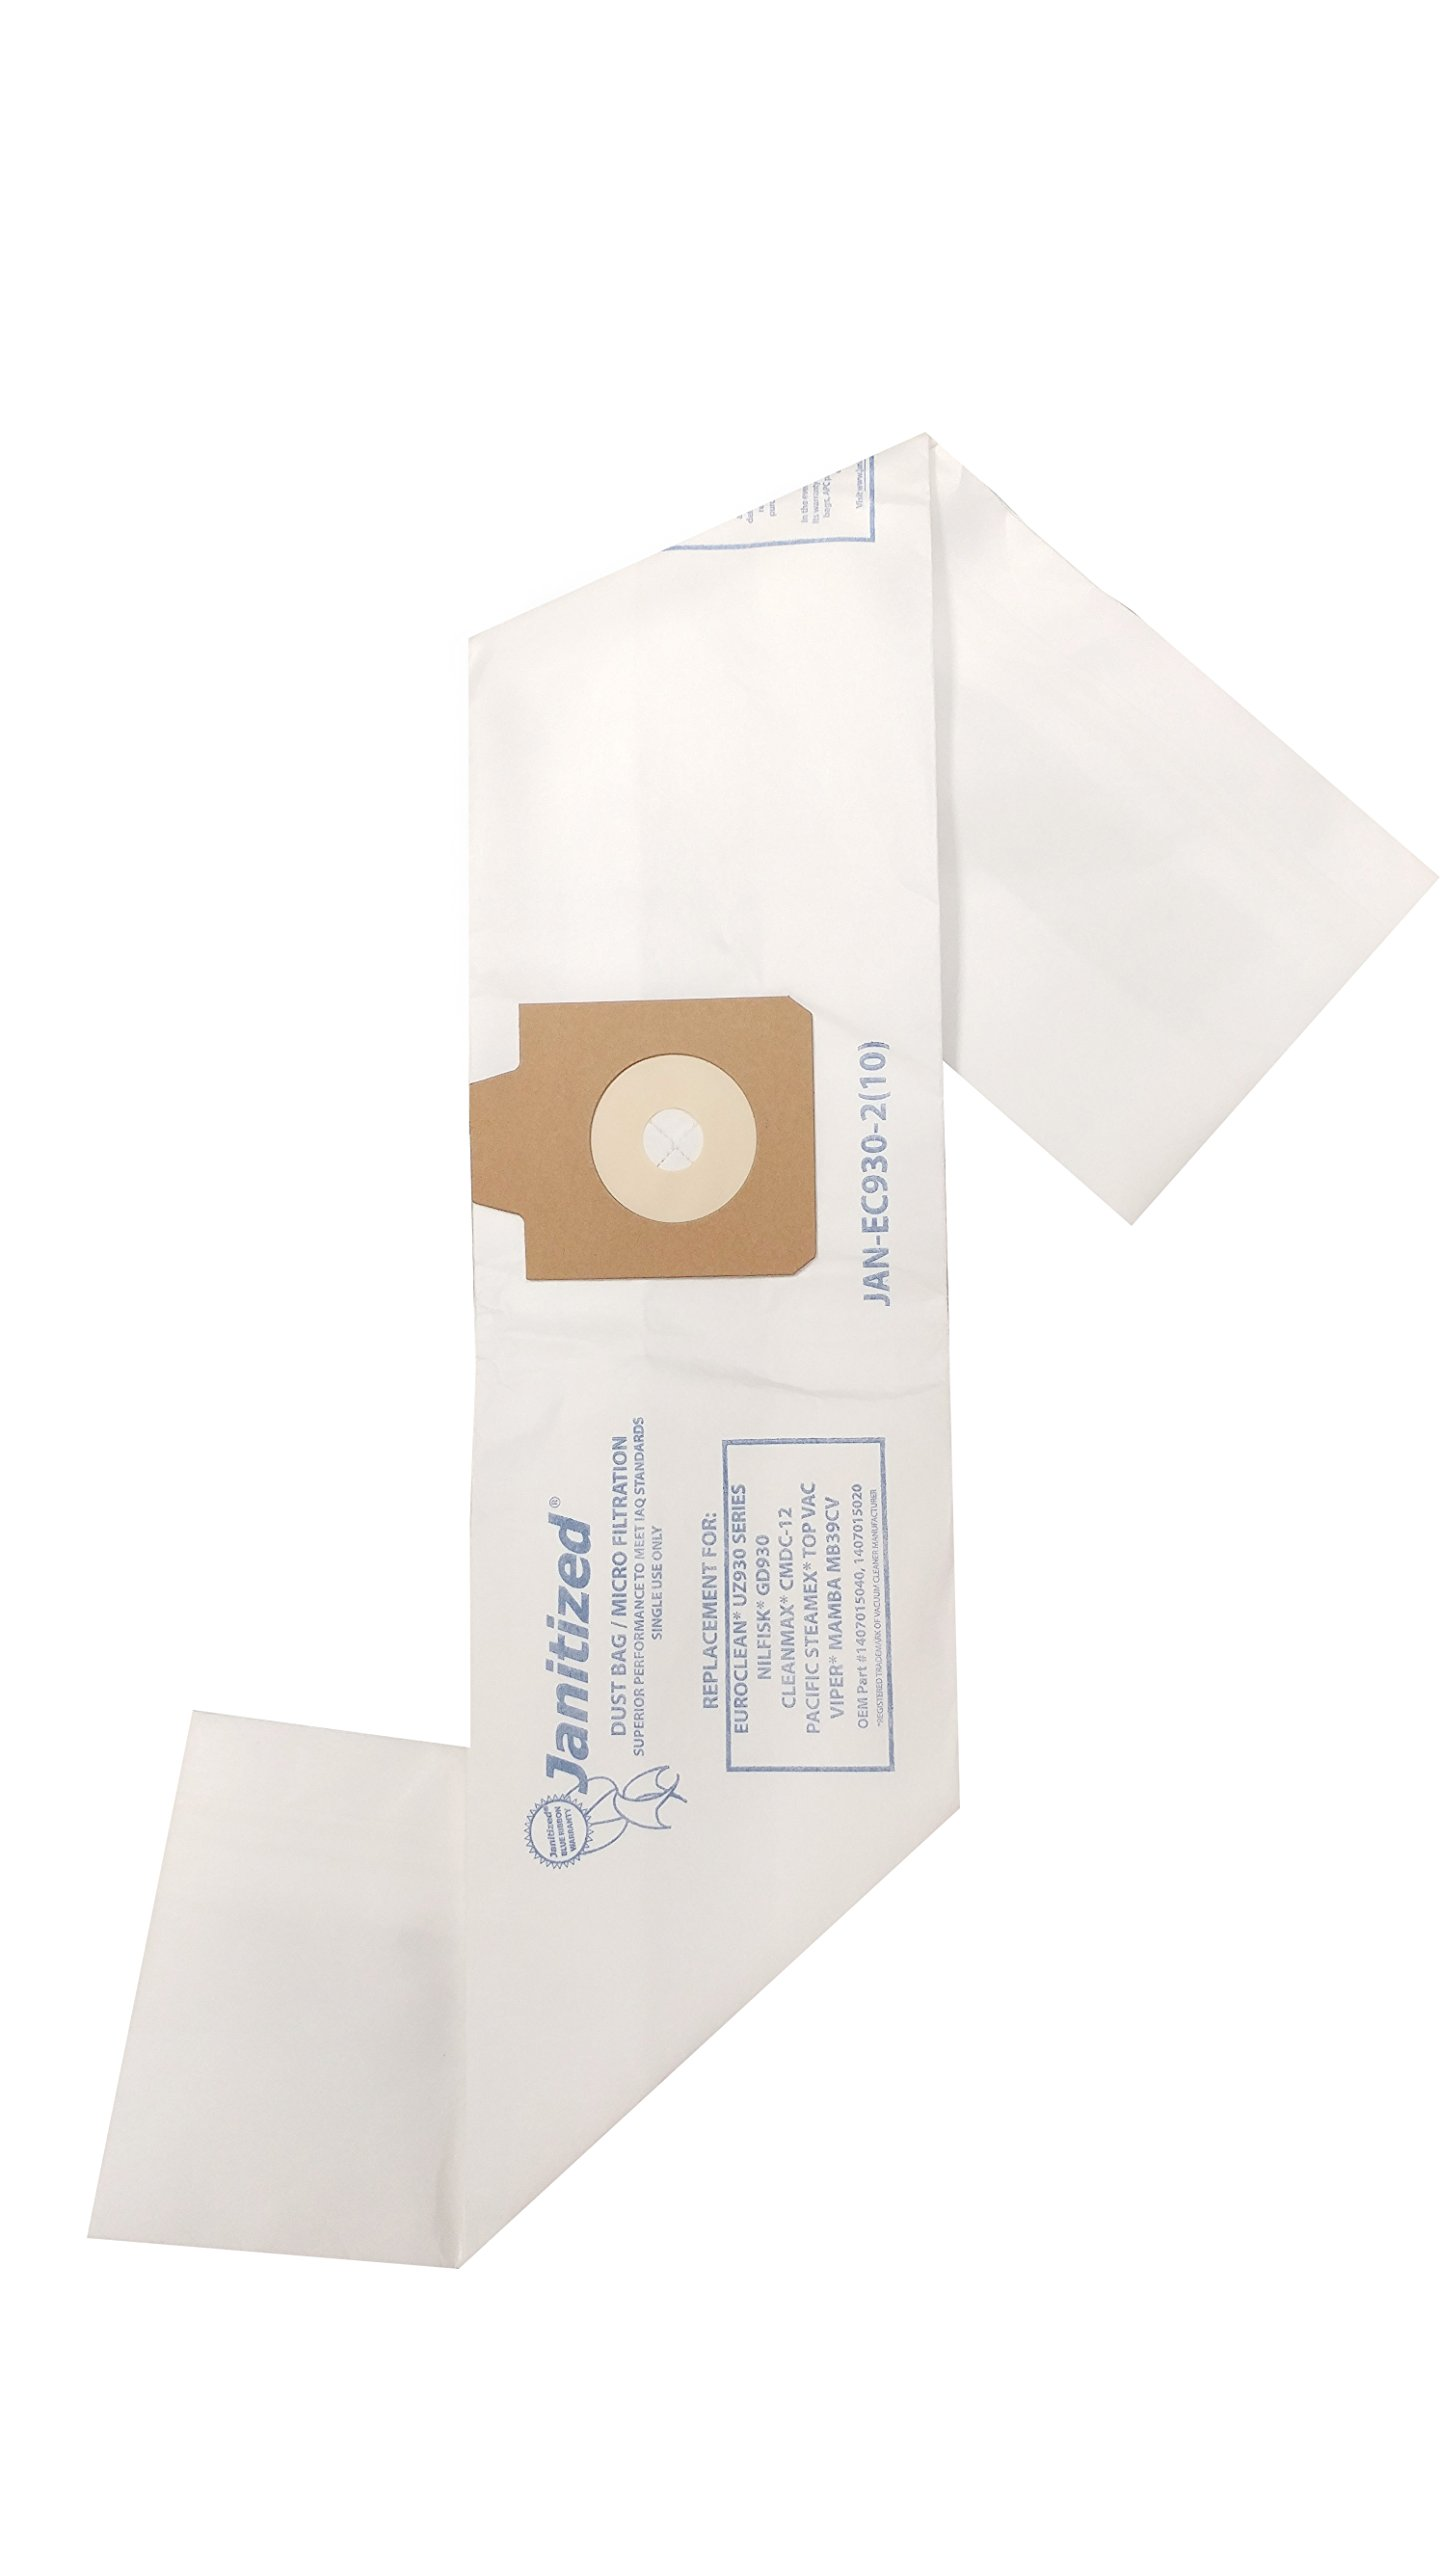 Janitized JAN-EC930-2(10) Paper Premium Replacement Commercial Vacuum Bag For Euroclean UZ930,Nilfisk GD930, Pullman Holt 390ASB, Viper Mamba, Pacific Steamex TopVac, CleanMax CMDC-12 Vacuum Cleaners (10 - 10 packs)